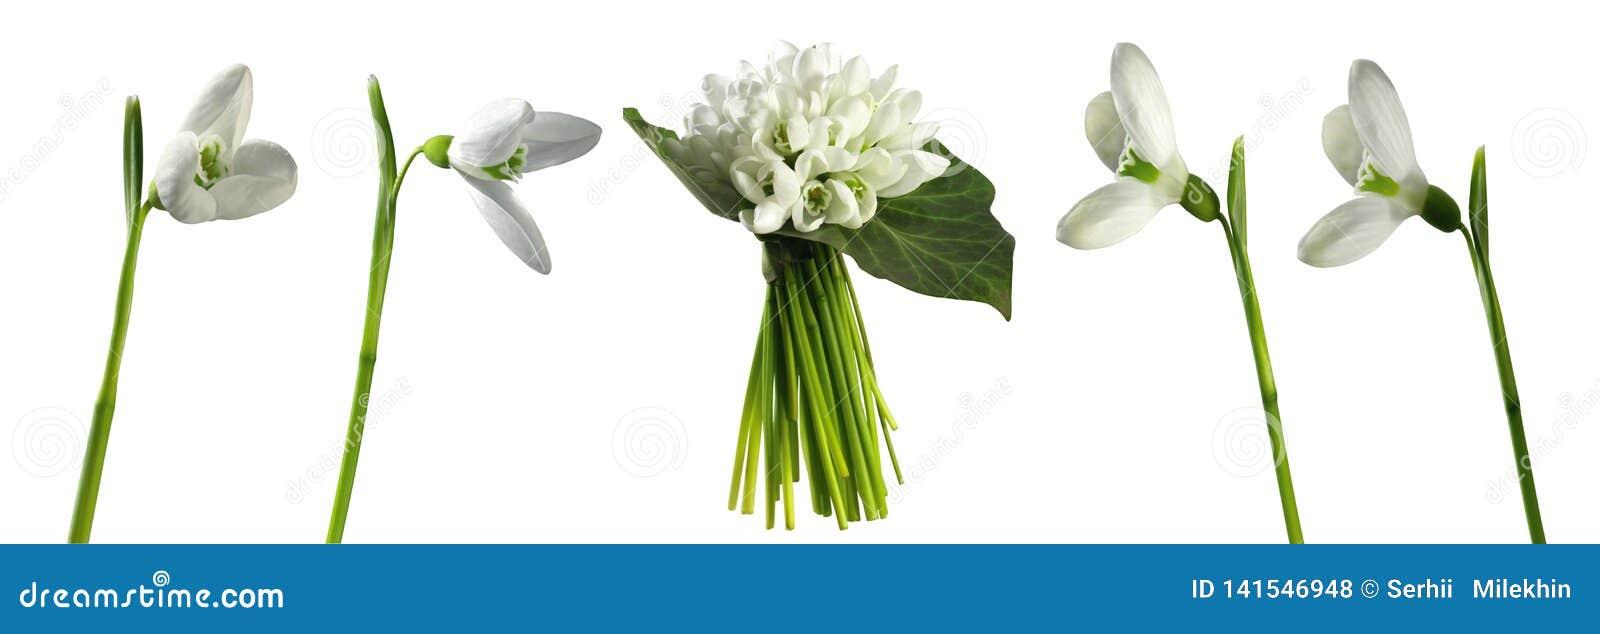 Snowdrops 在白色背景隔绝的第一朵春天花